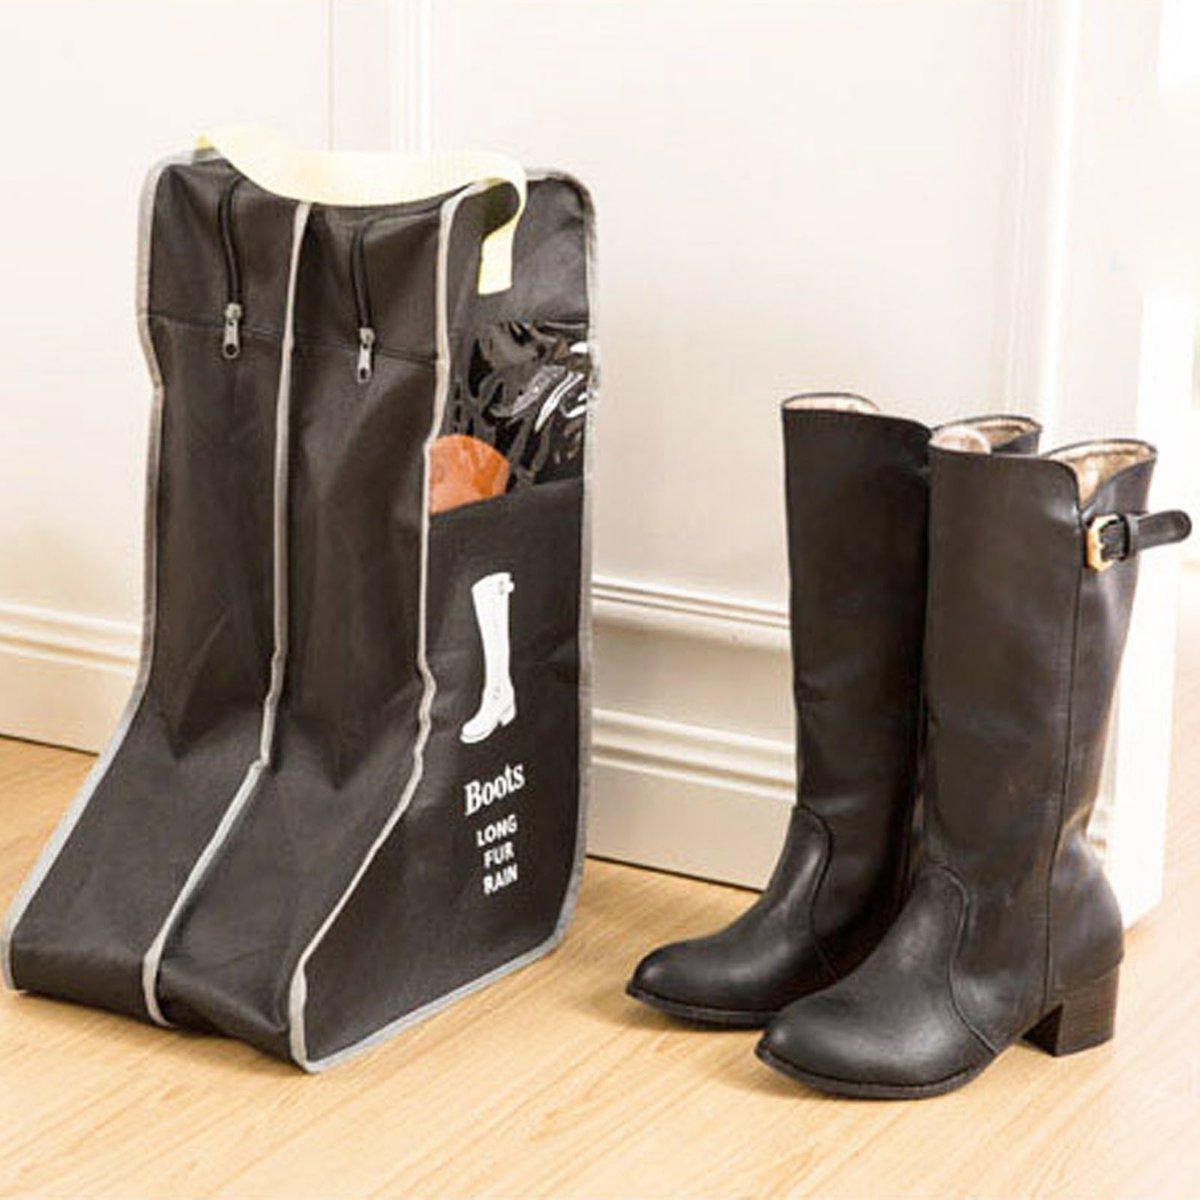 【Black】Boots Shoes Pouch Zipper Bag Portable Waterproof Travel Storage